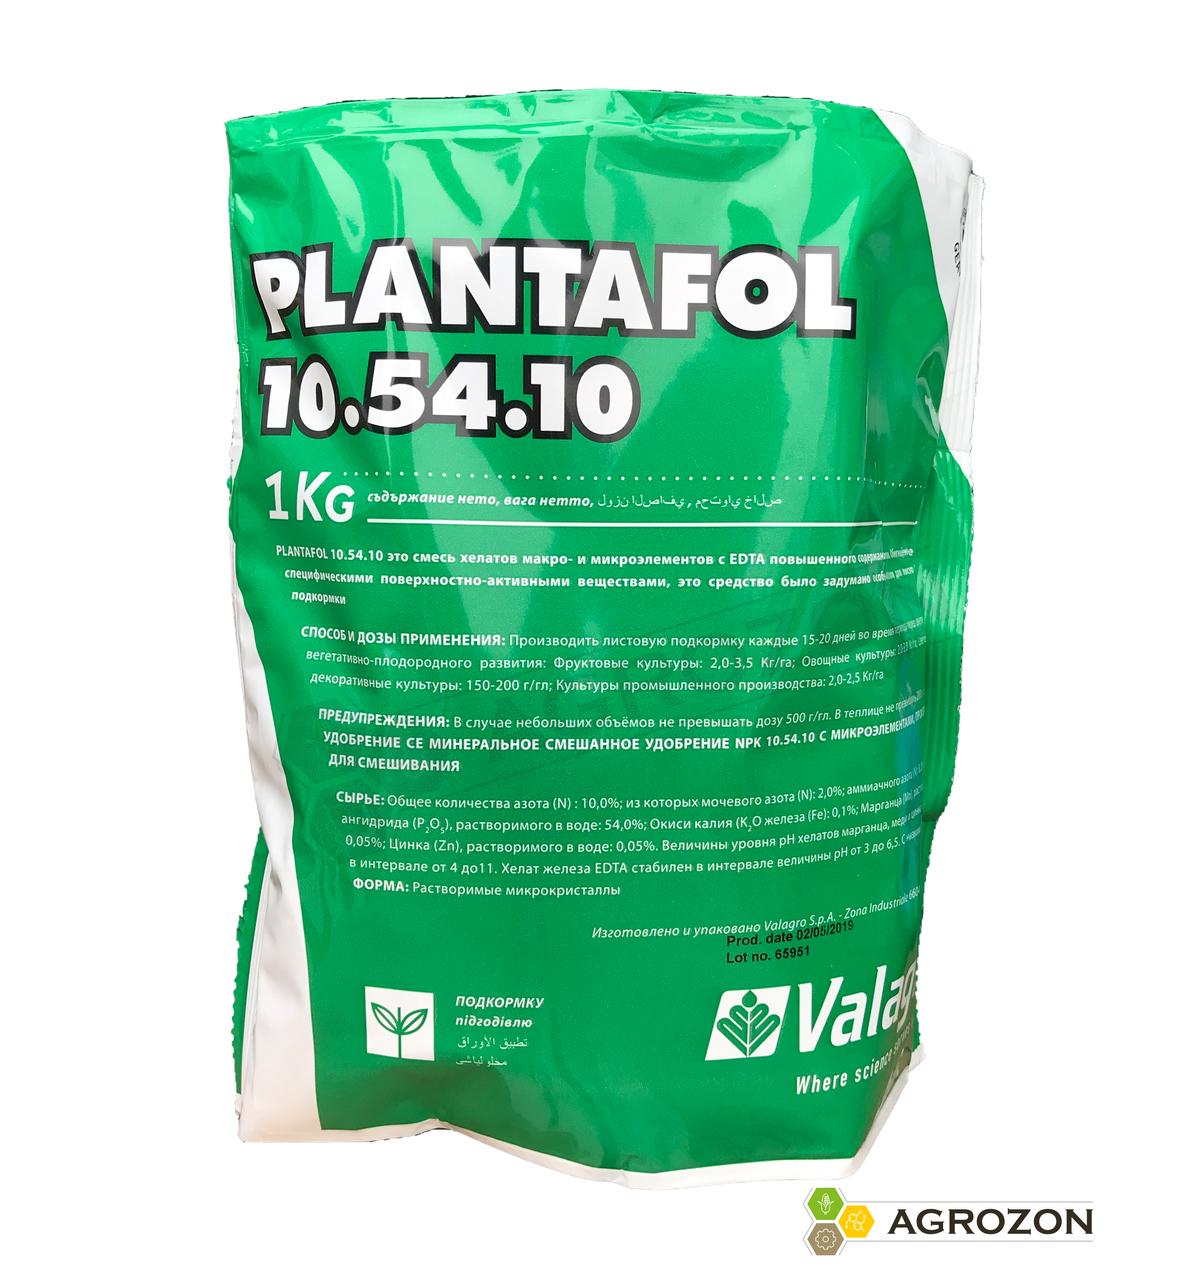 Удобрение Плантафол / Plantafol 10+54+10 Valagro - 1 кг